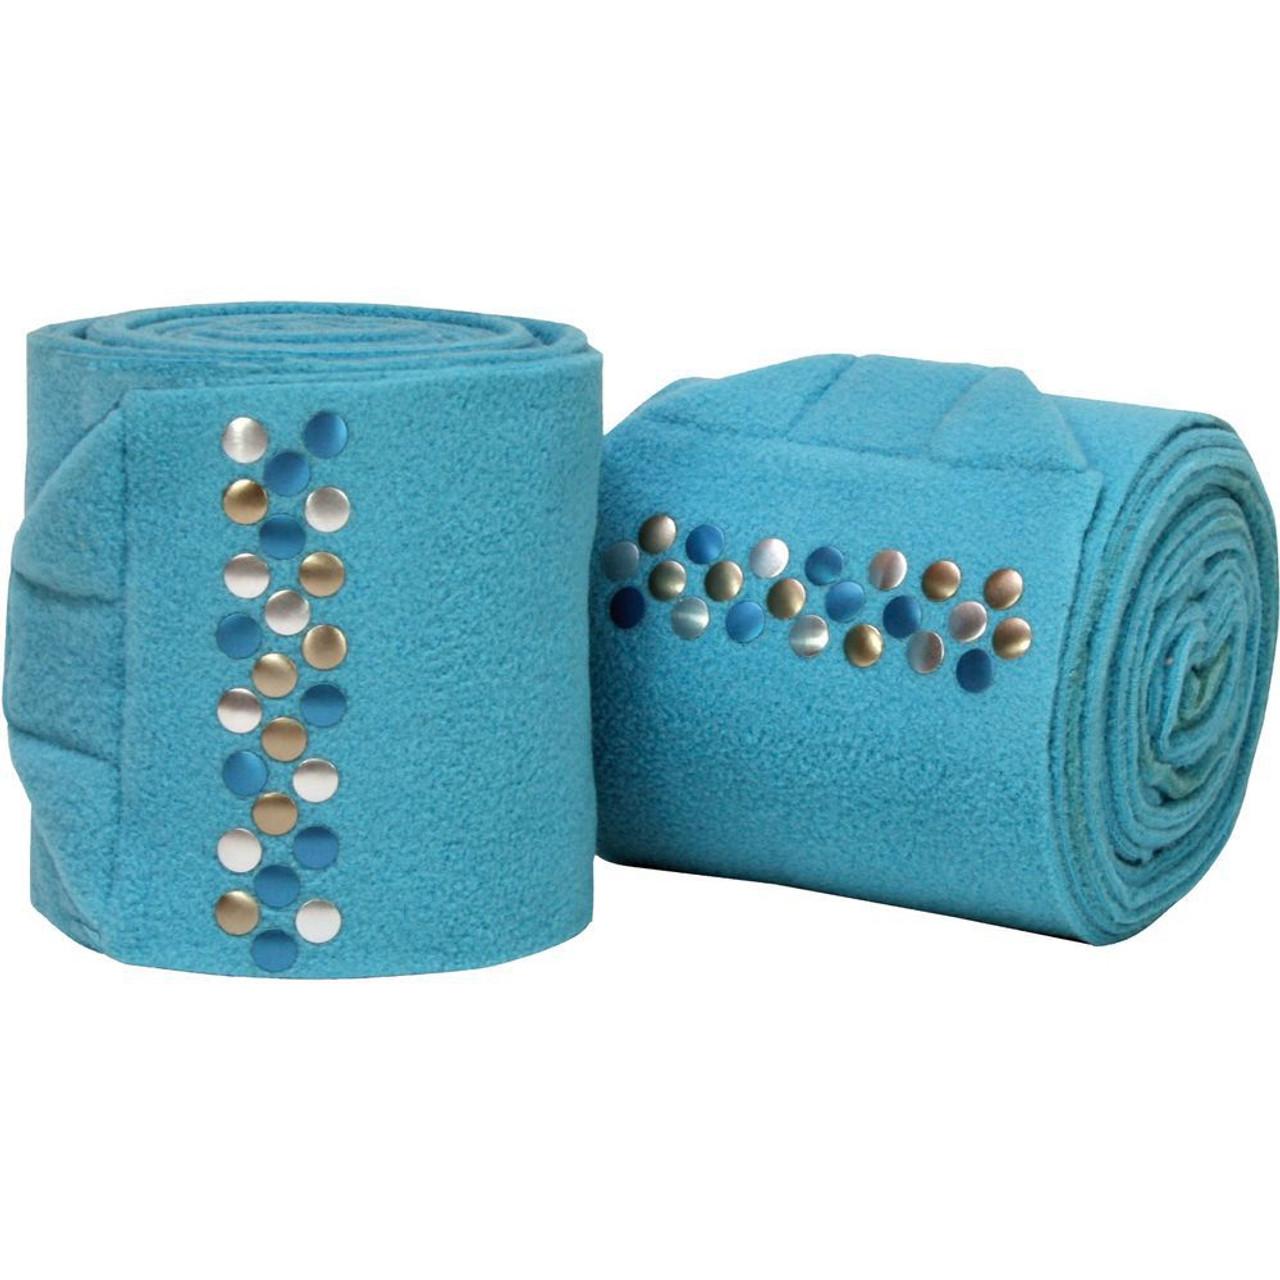 Equest Bandages